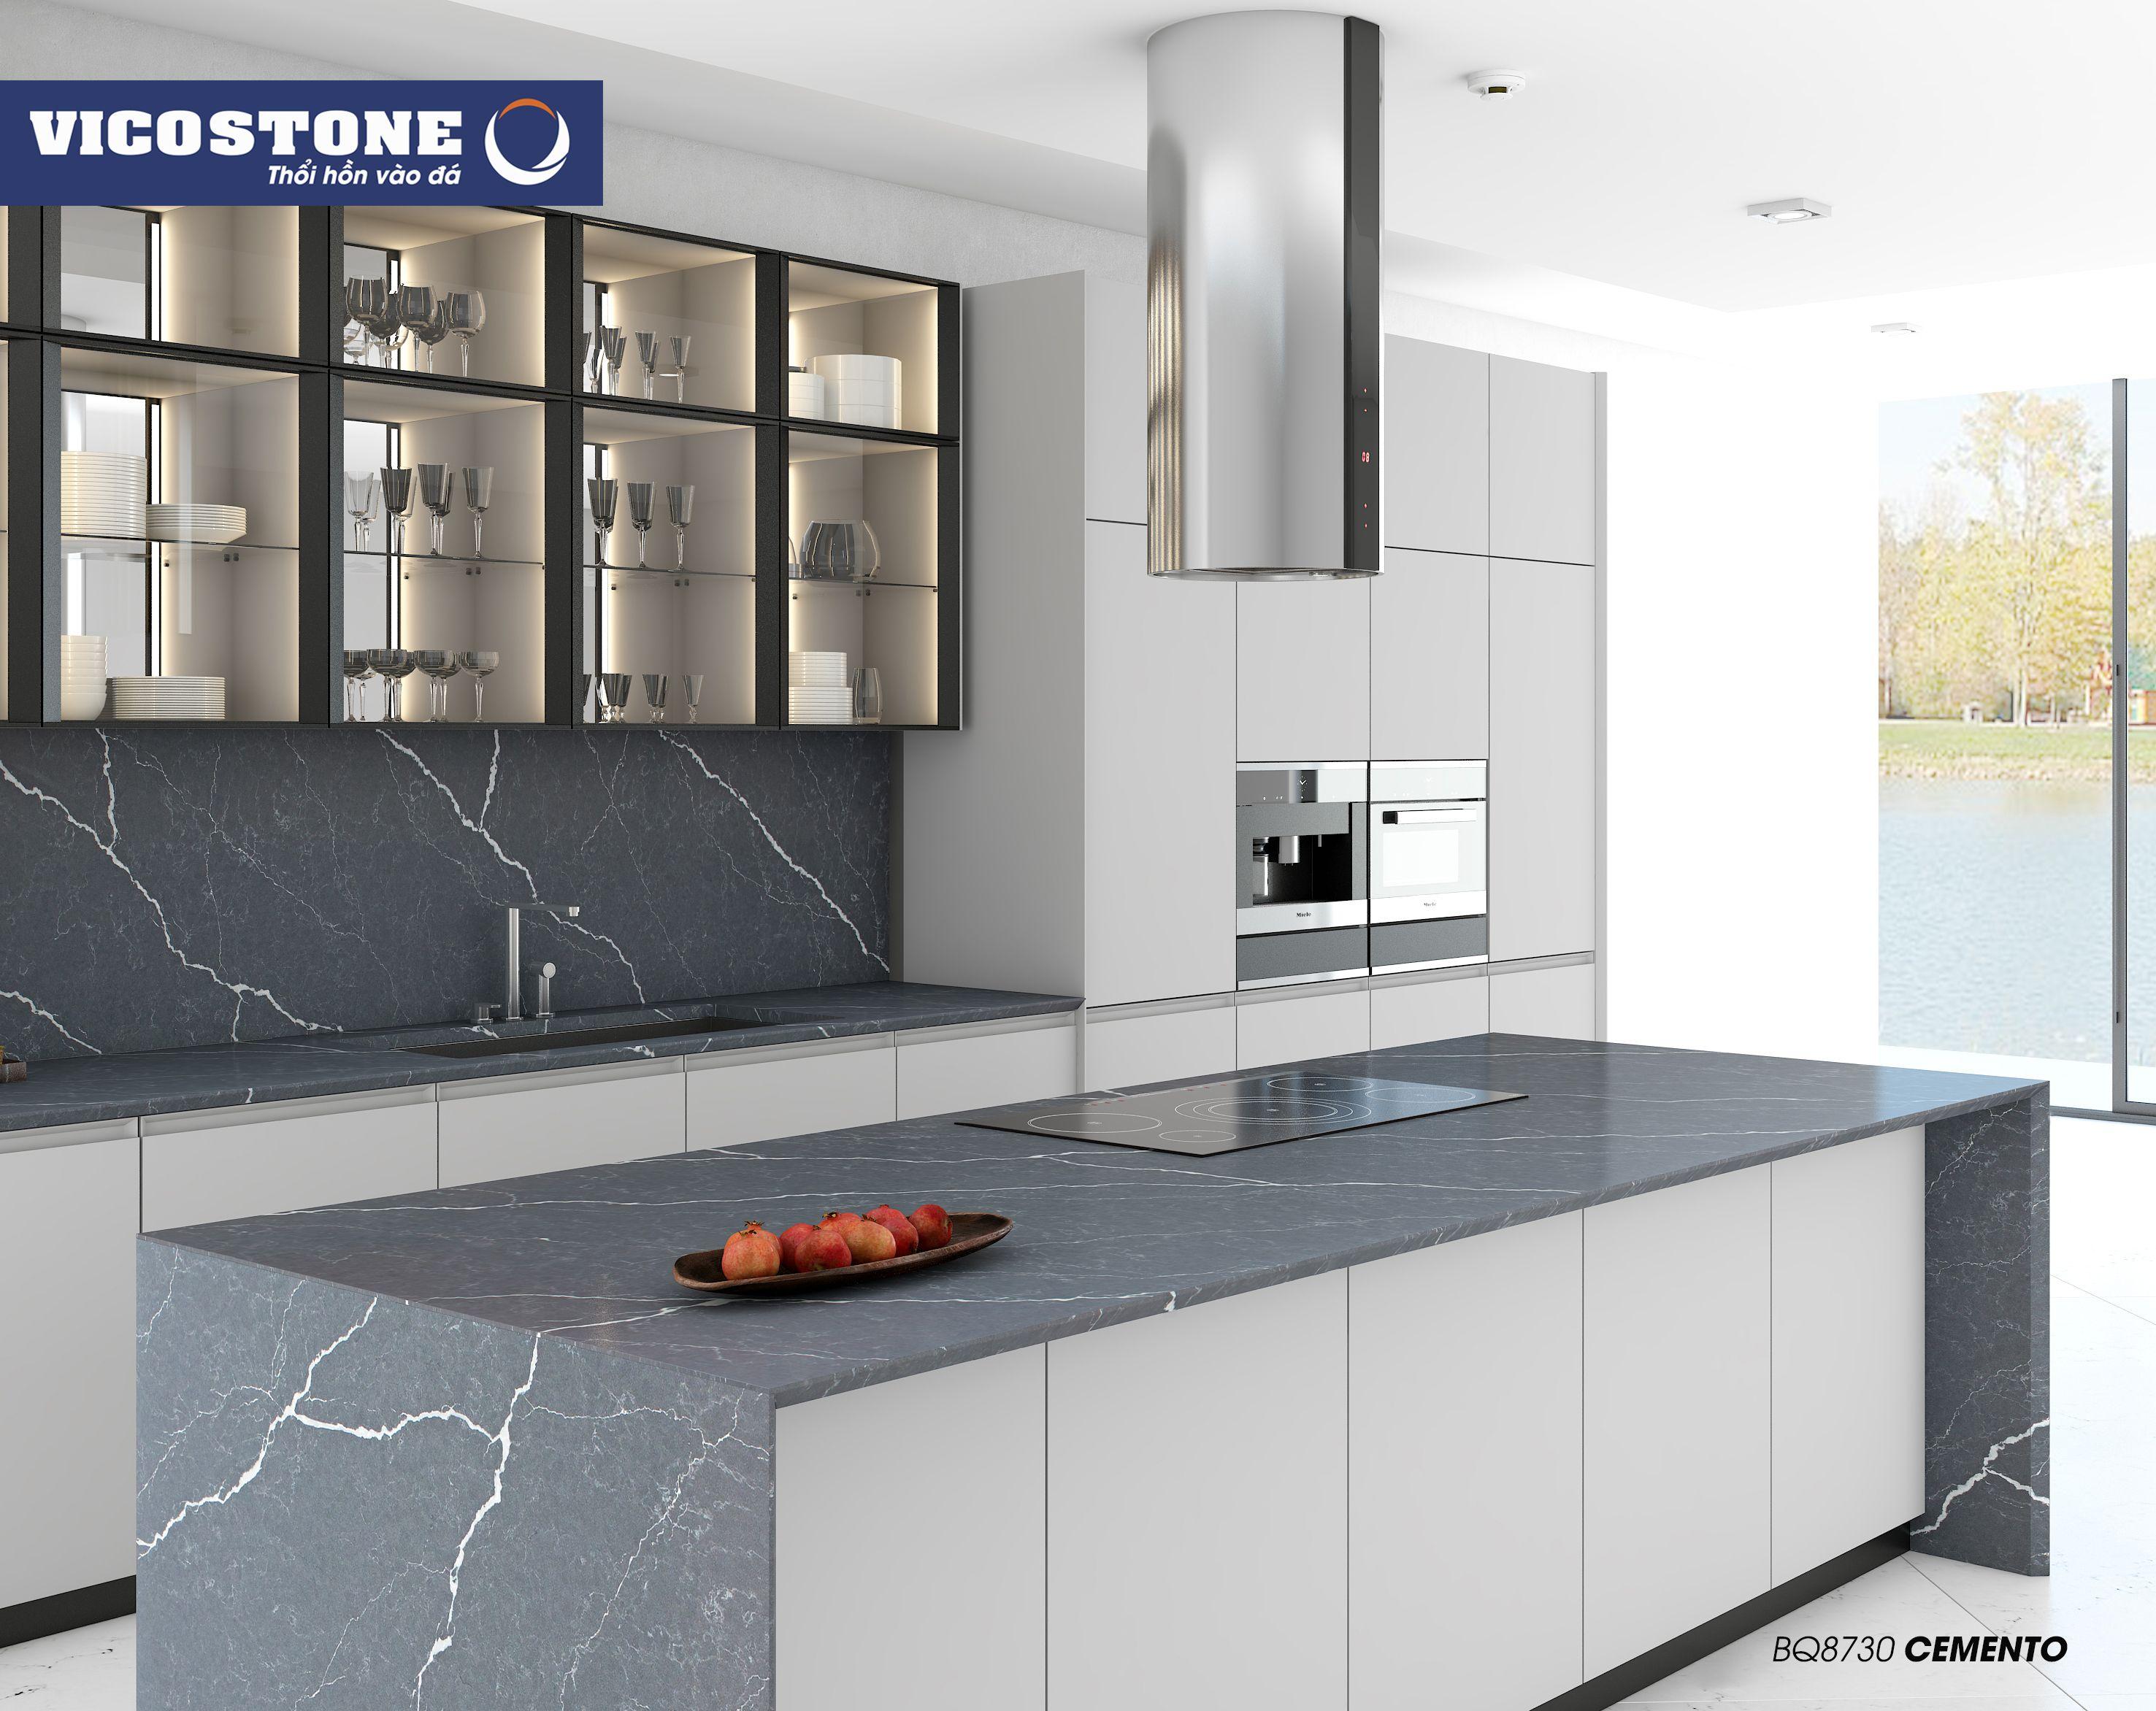 Cemento Bq8730 In 2020 Countertop Design Countertops Kitchen Redo